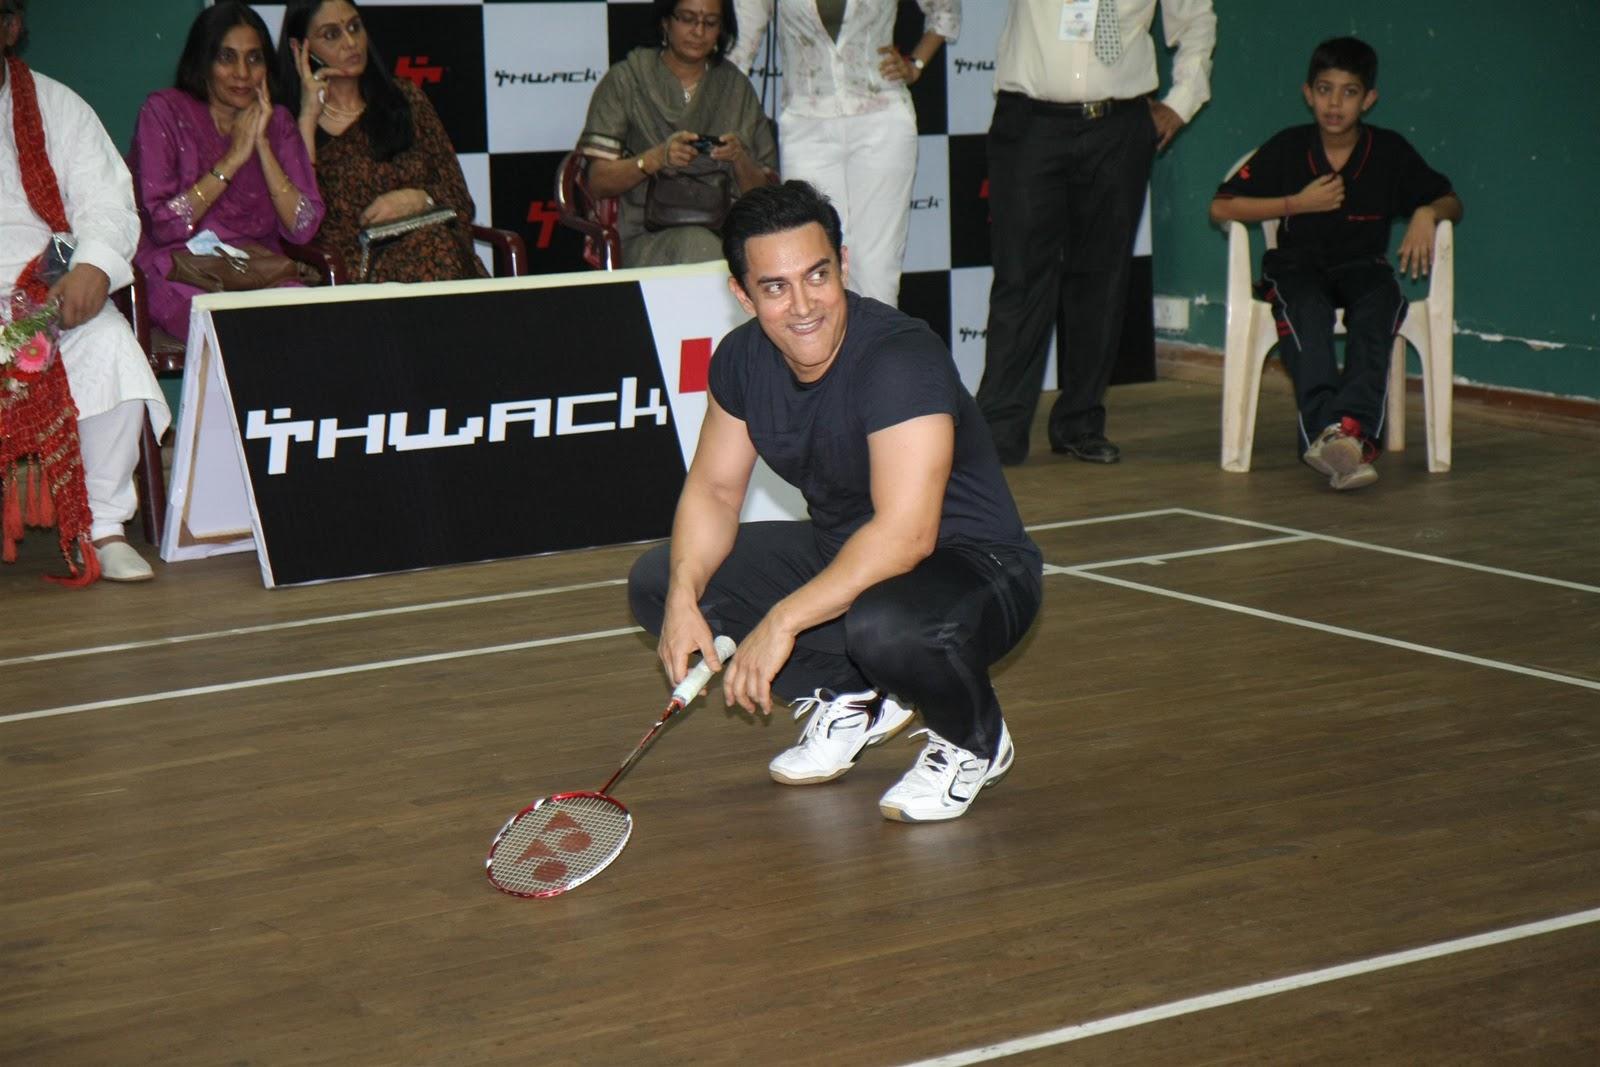 http://3.bp.blogspot.com/-NYuDMp_JjM4/TutwNH3sqxI/AAAAAAAAE_g/R6qkiN8Mxto/s1600/Aamir-Khan-Saina-Nehwal-at-exhibition-match-10.JPG